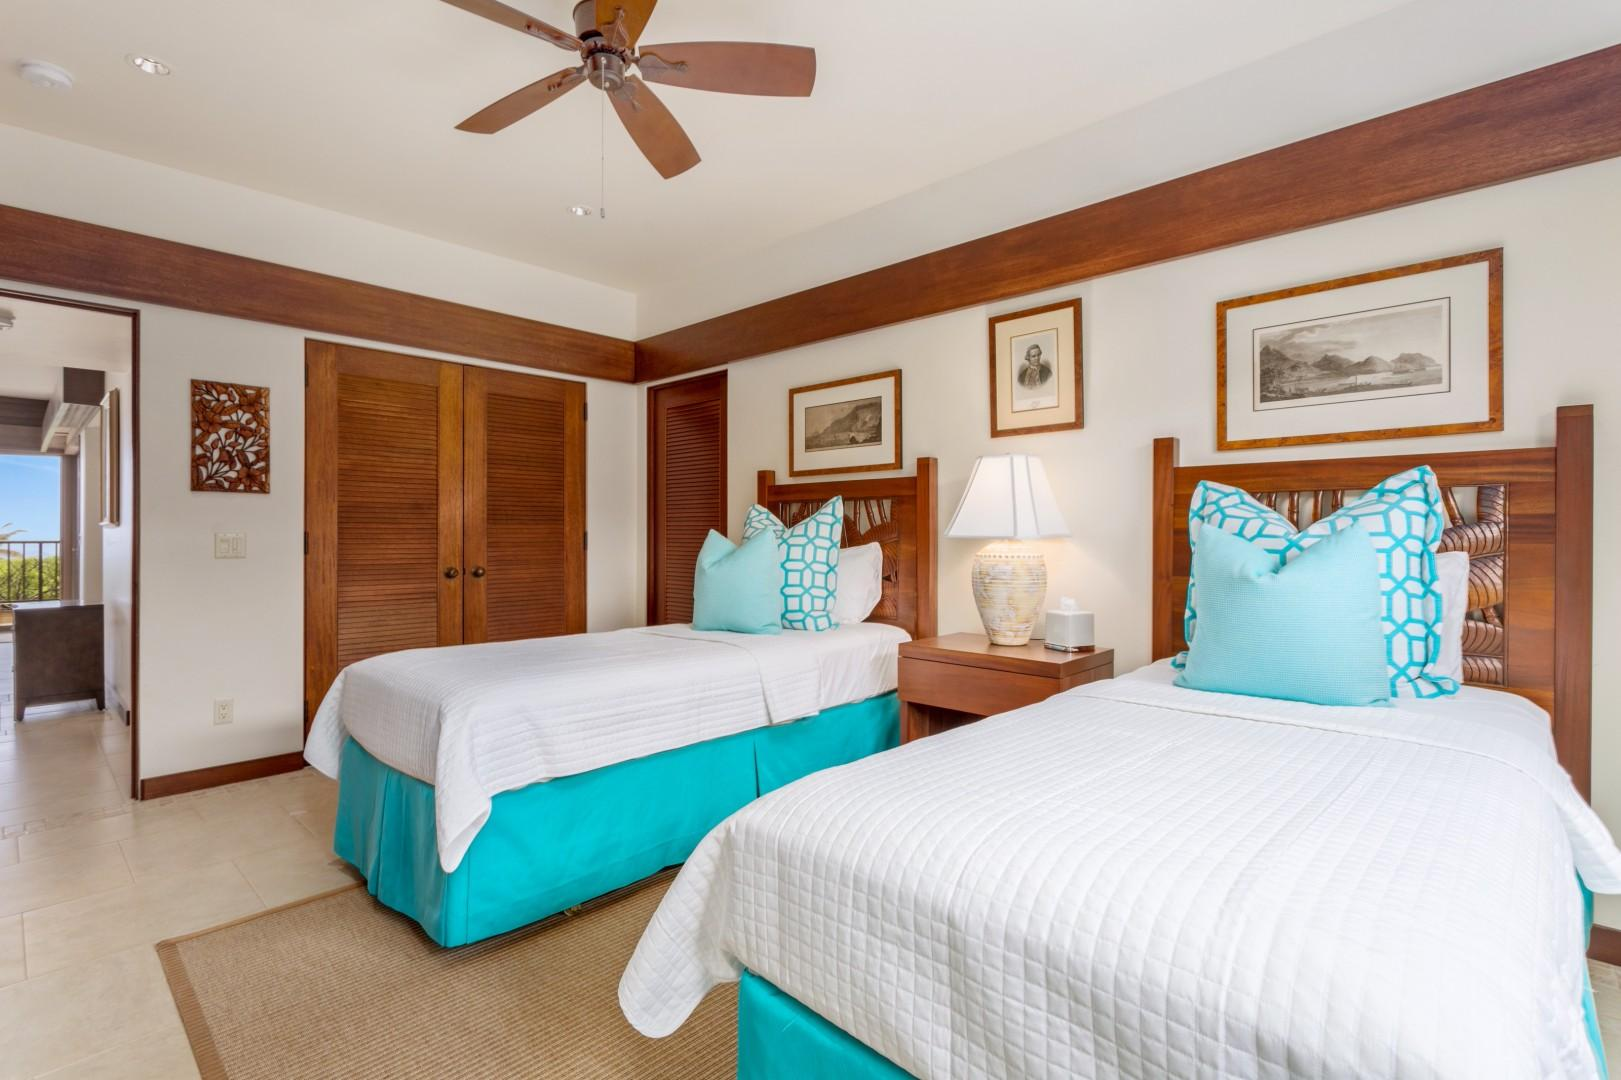 Alternate view of third bedroom.